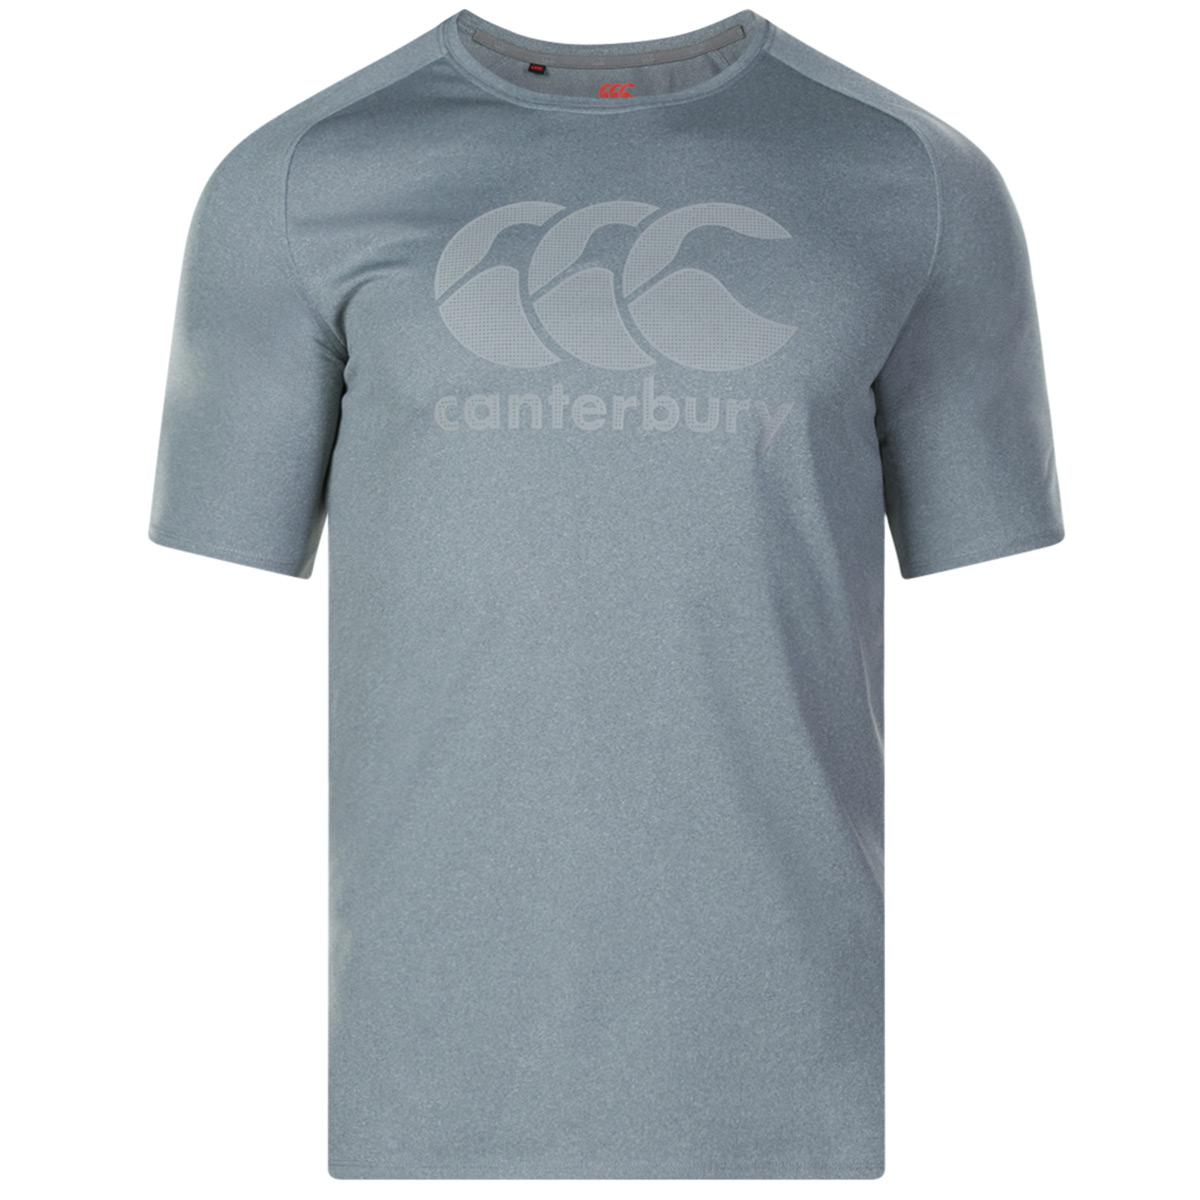 Canterbury-Para-hombre-Core-vapodri-Grande-logotipo-Quickdry-transpirable-T-Shirt miniatura 21